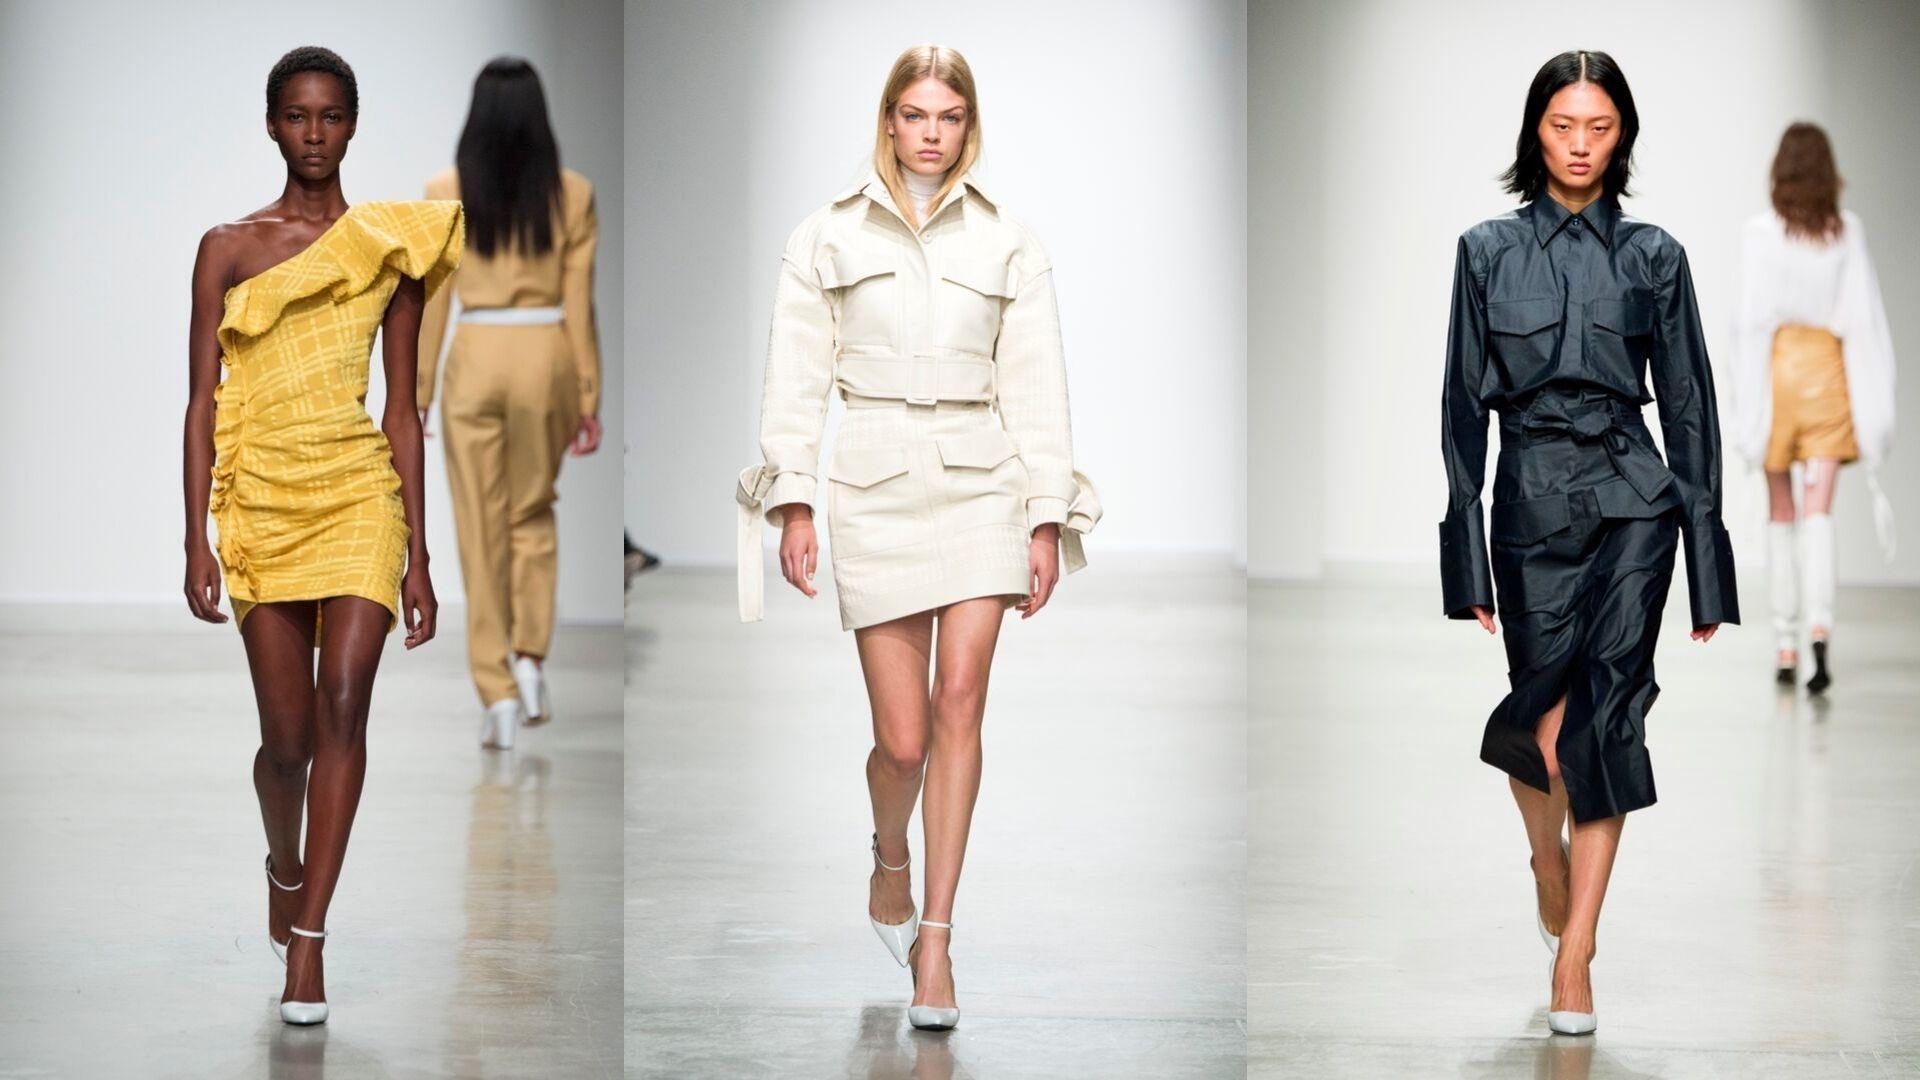 Dubai-Based Designer Kristina Fidelskaya Presents Their S/S20 Show At Paris Fashion Week